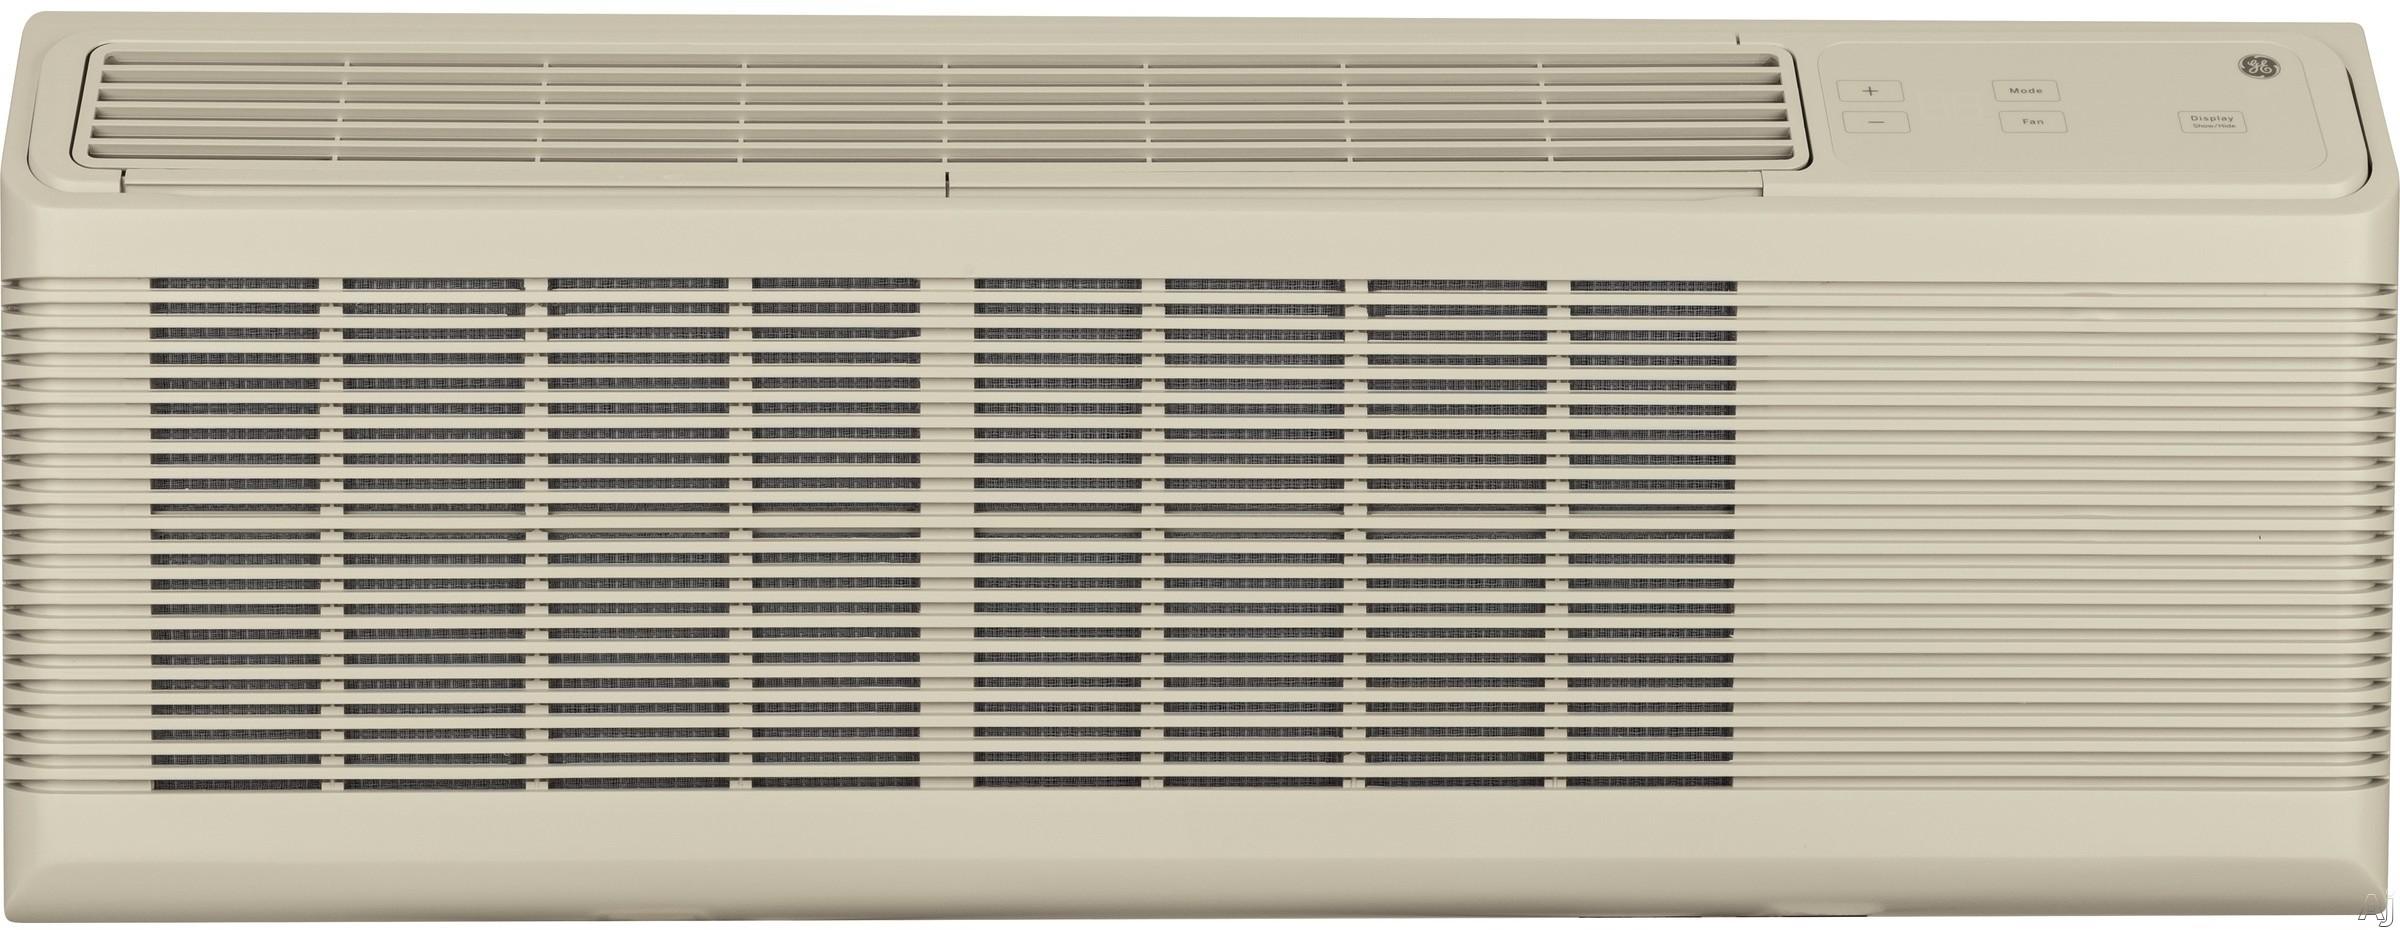 GE Zoneline AZ45E15DAB 14,900 BTU Packaged Terminal Air Conditioner with Electric Heat, 10.5 EER, 4.6 Pints Per Hour Dehumidification, R410A Refrigerant and 230/208 Volt AZ45E15DAB